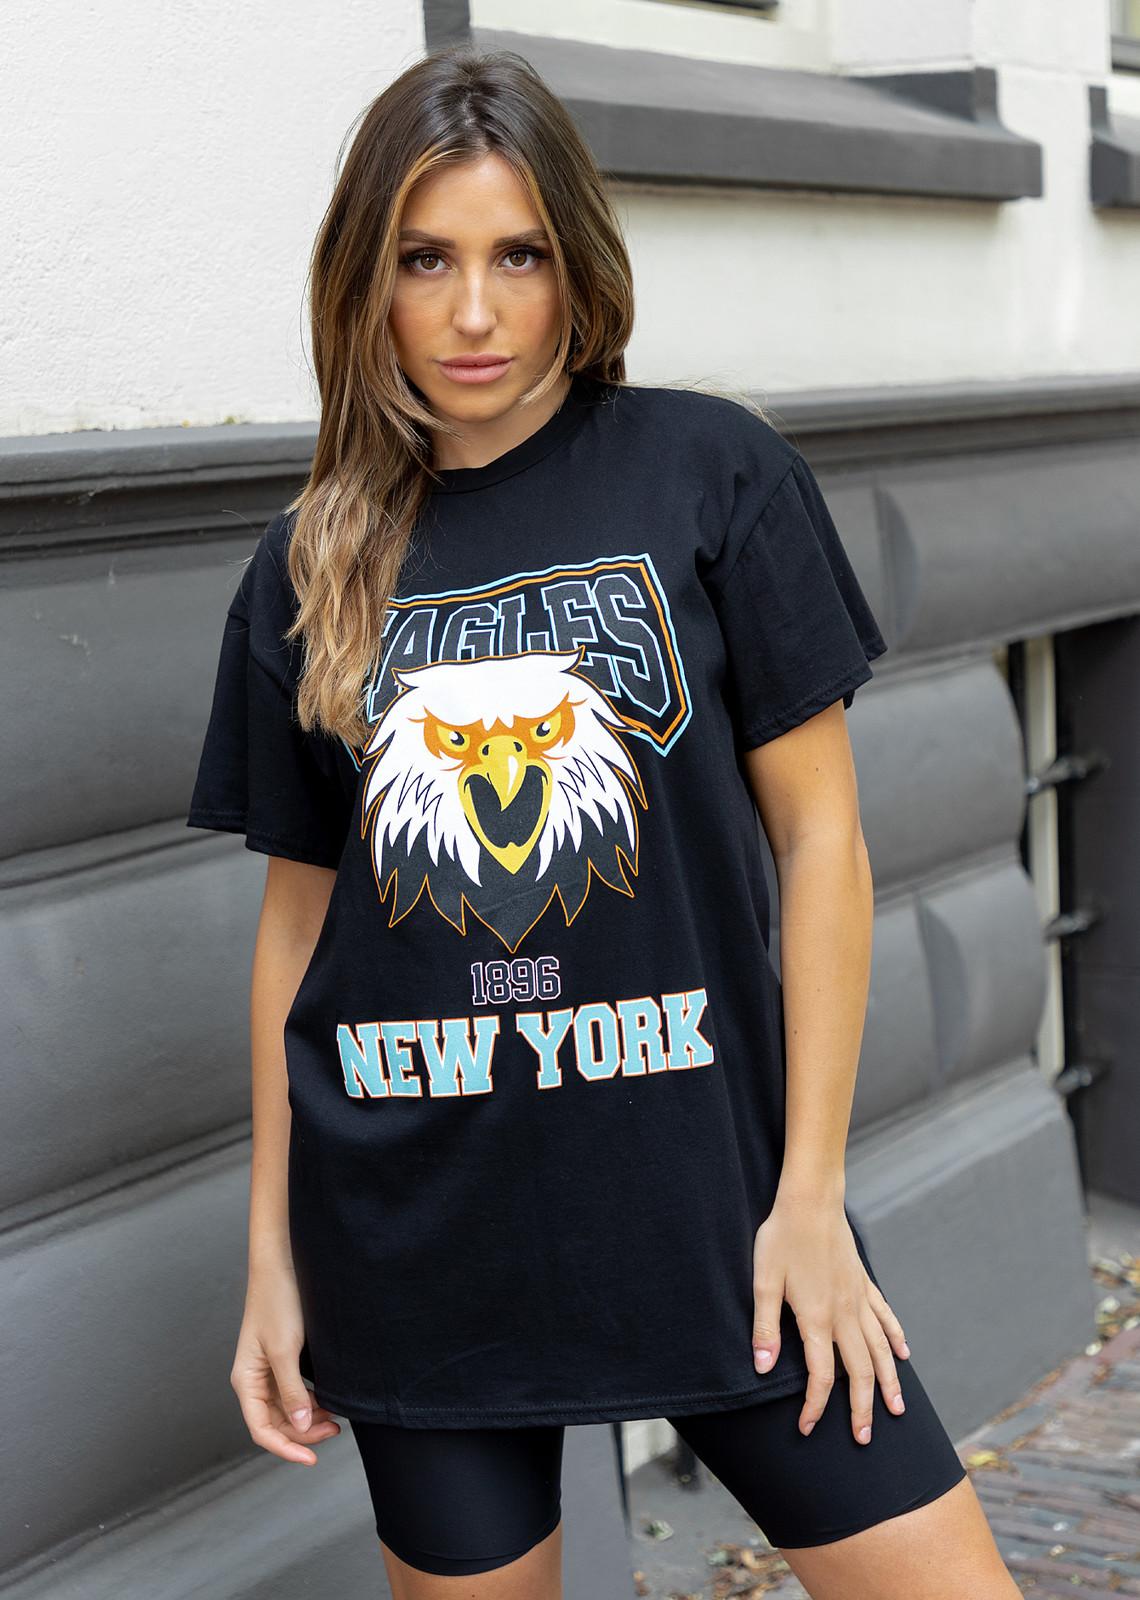 T-shirt dress New York black